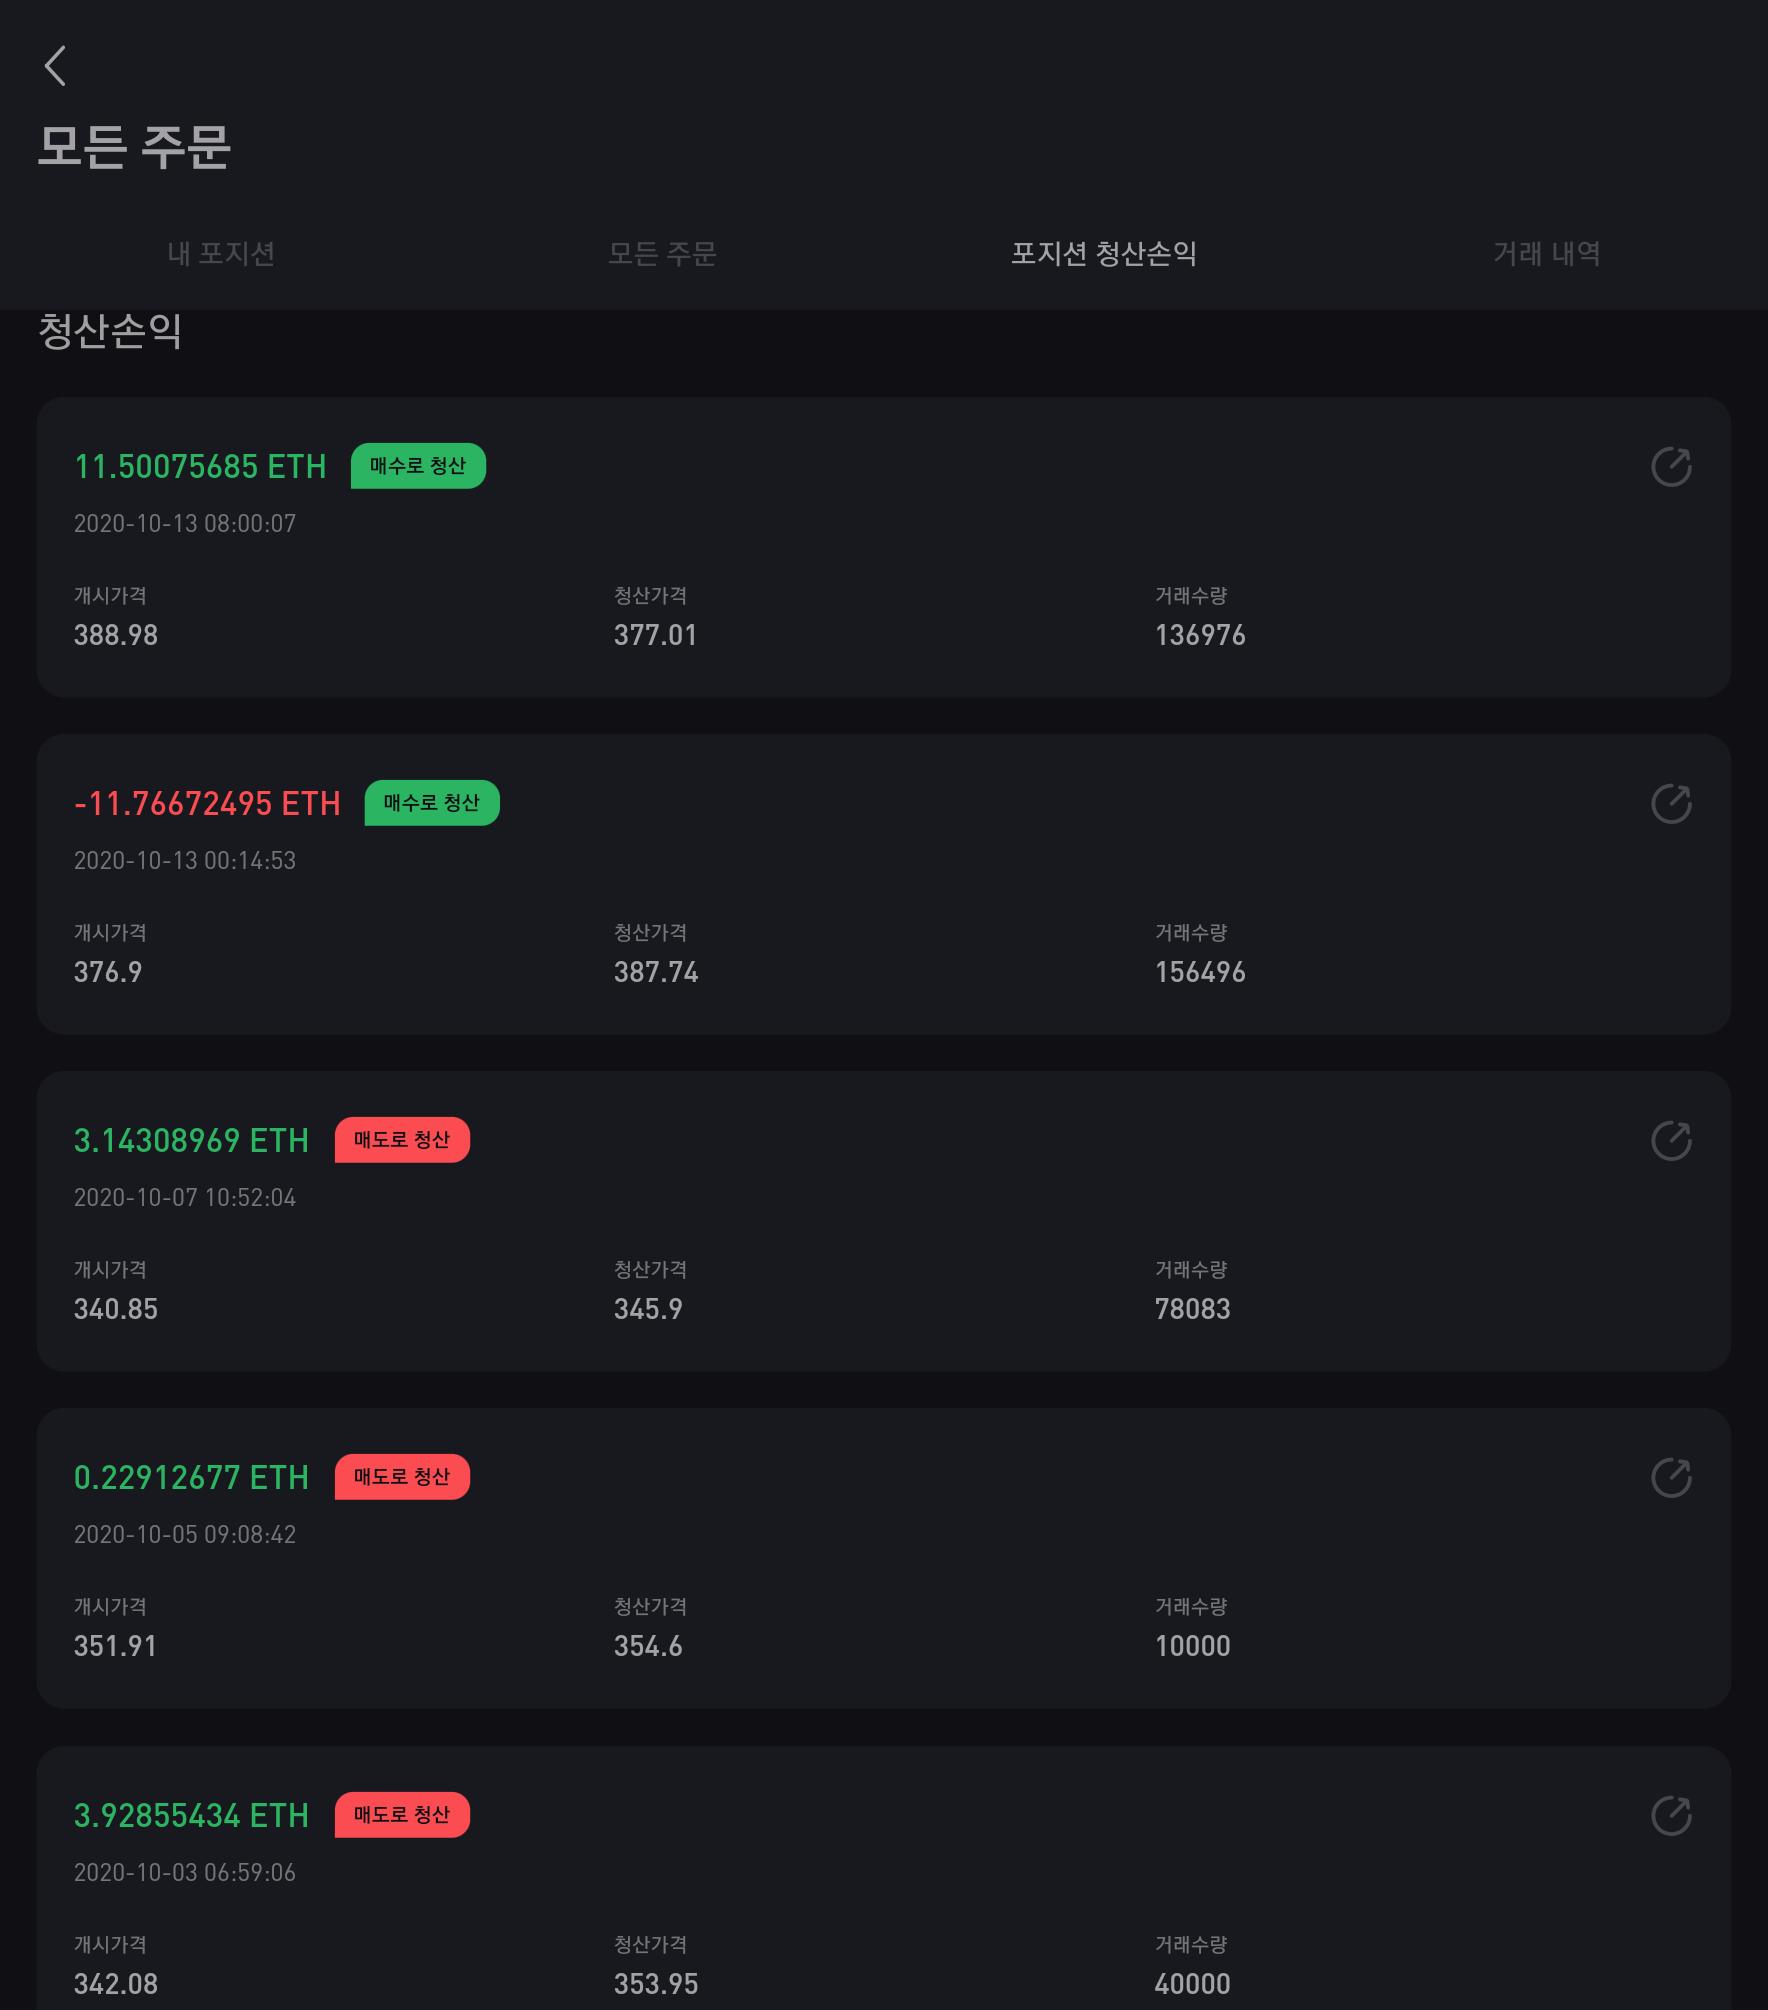 Screenshot_20201013-233058.png : 마진이 이렇게 무섭다 ㅅㅂ...